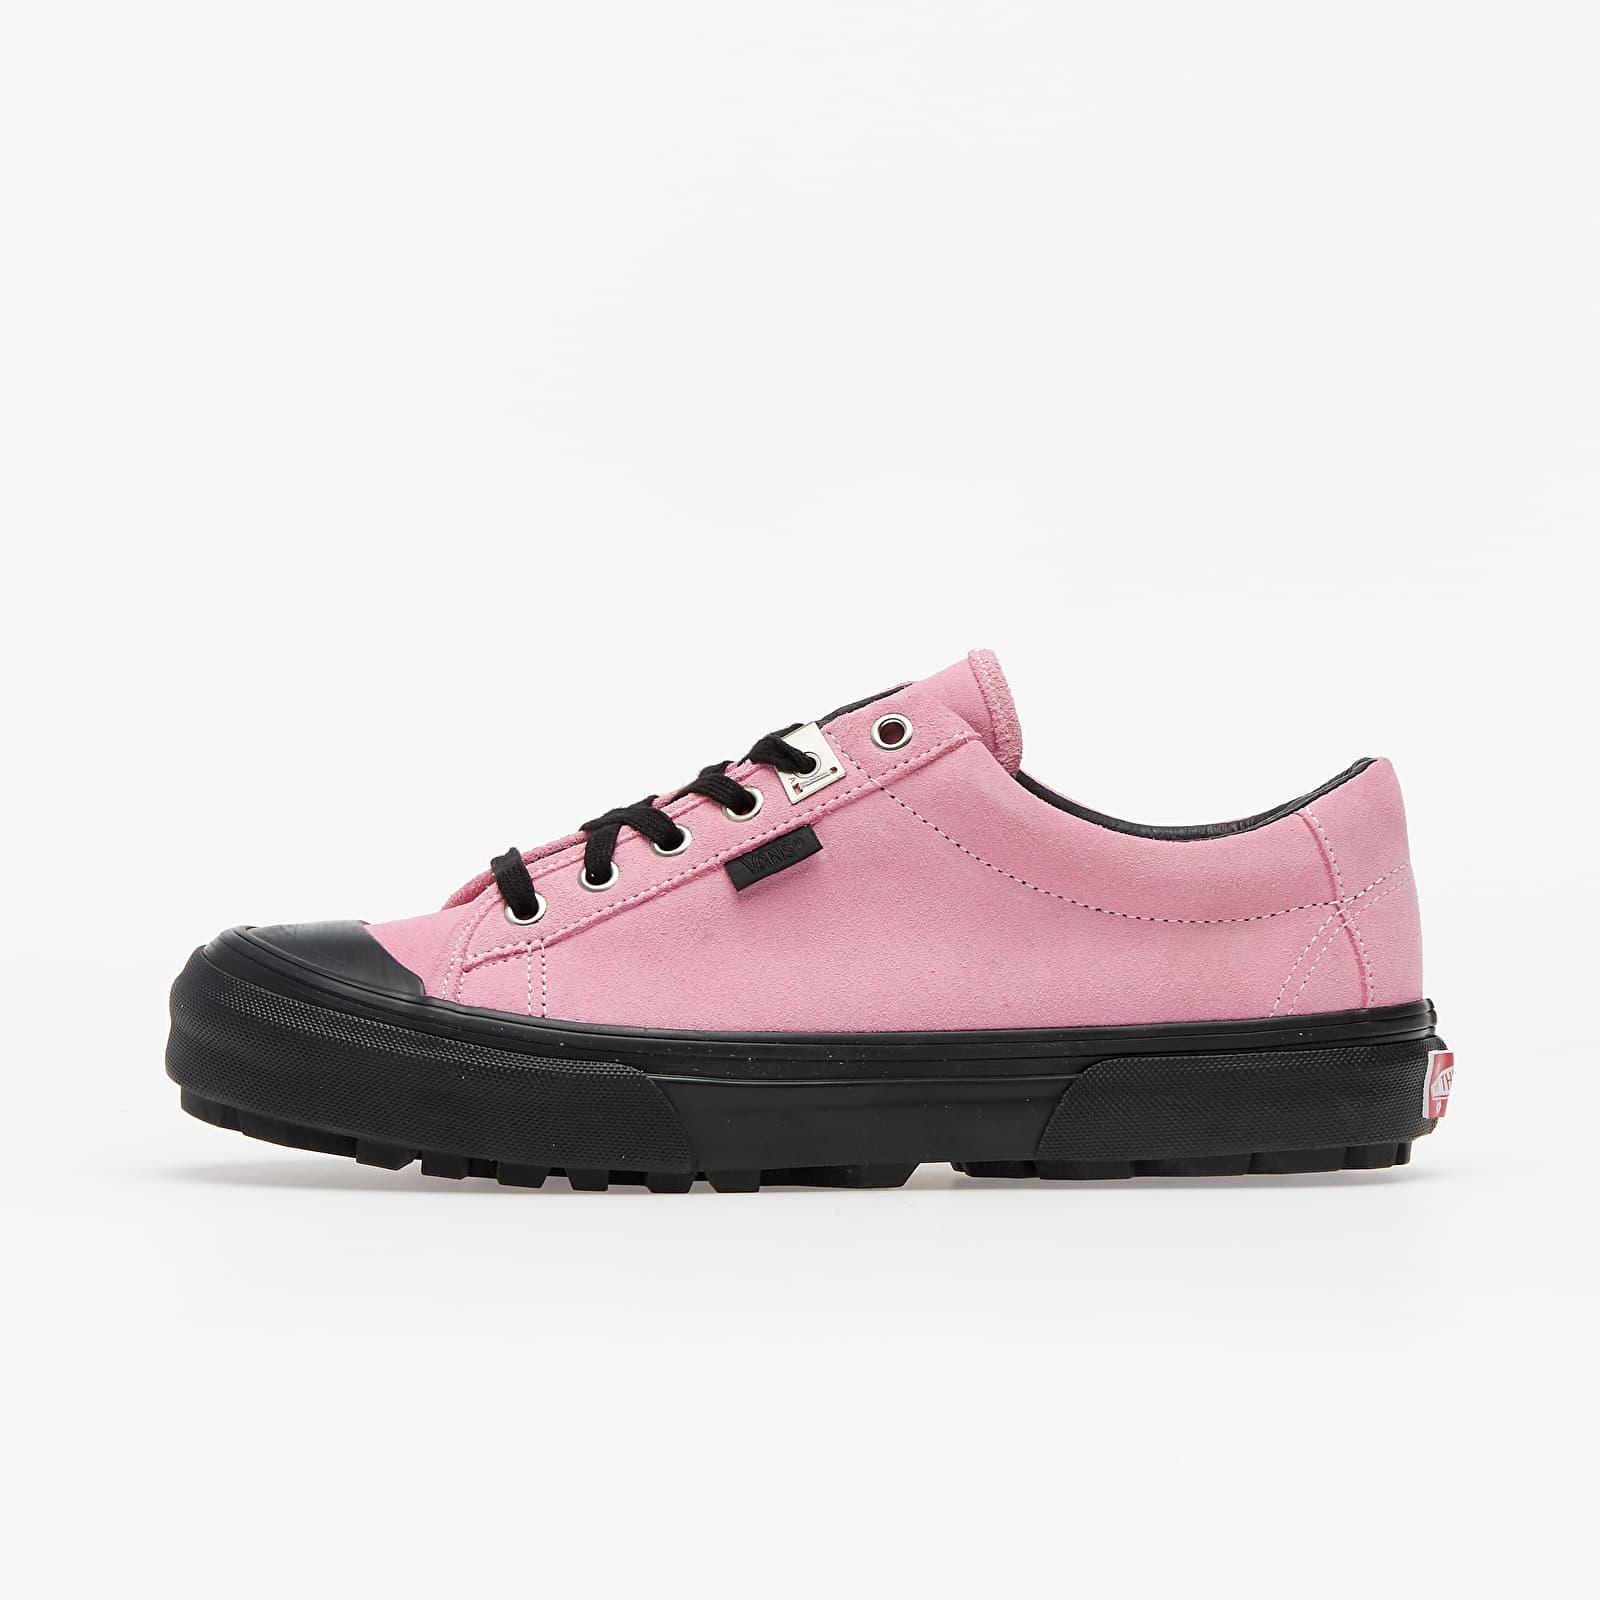 Vans Vault Style 29 LX (ALYX) Sea Pink | Footshop